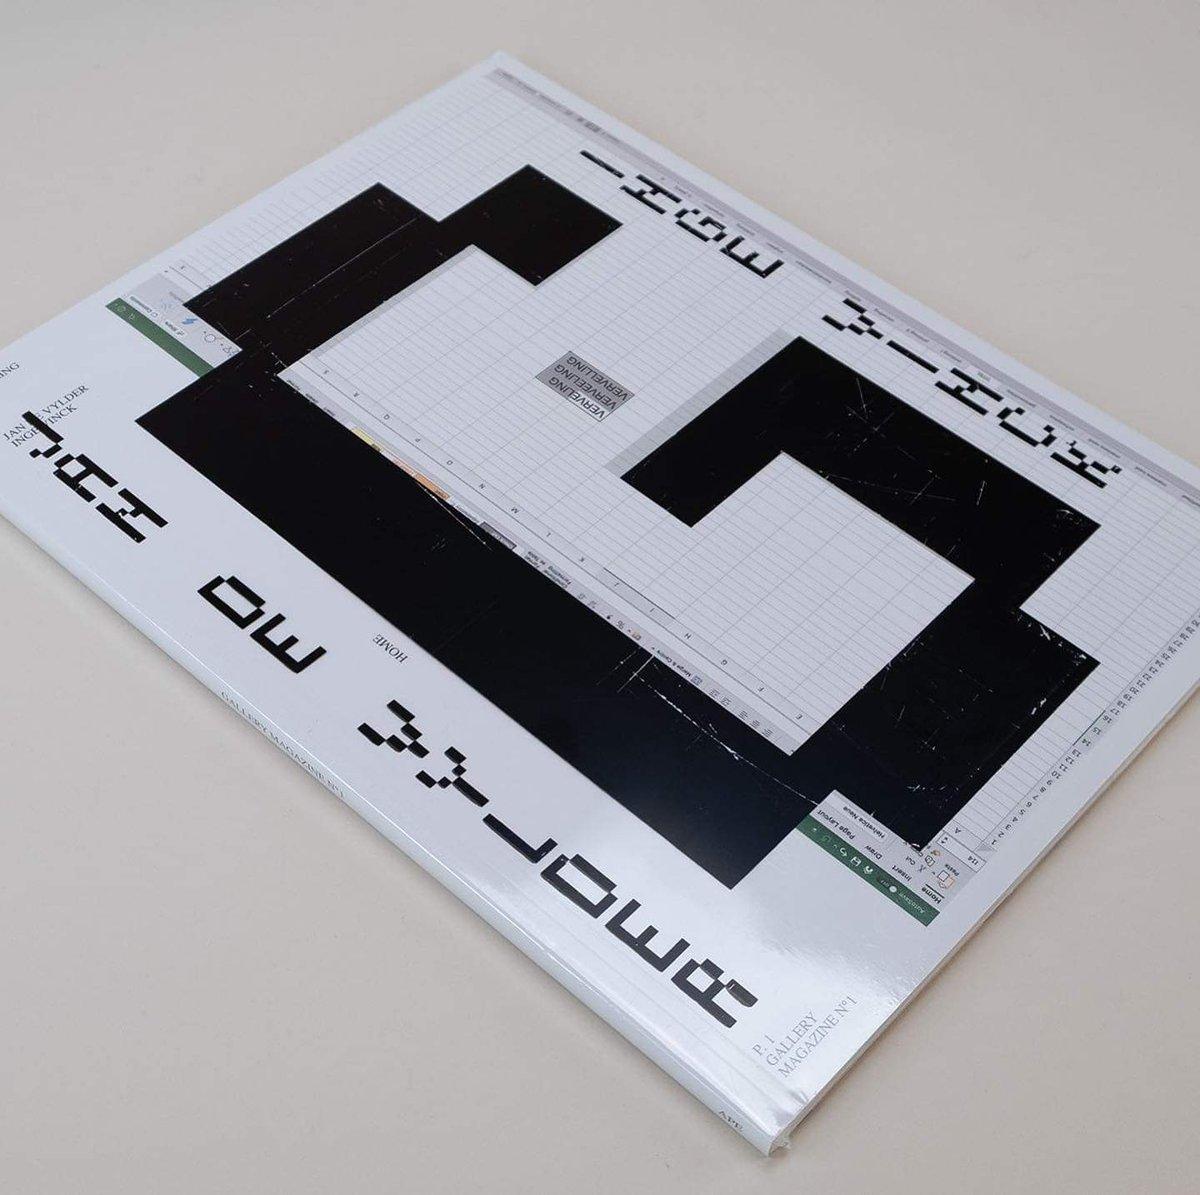 CARROUSEL JOURNEY UNIVERSUM 2 - Flag 13